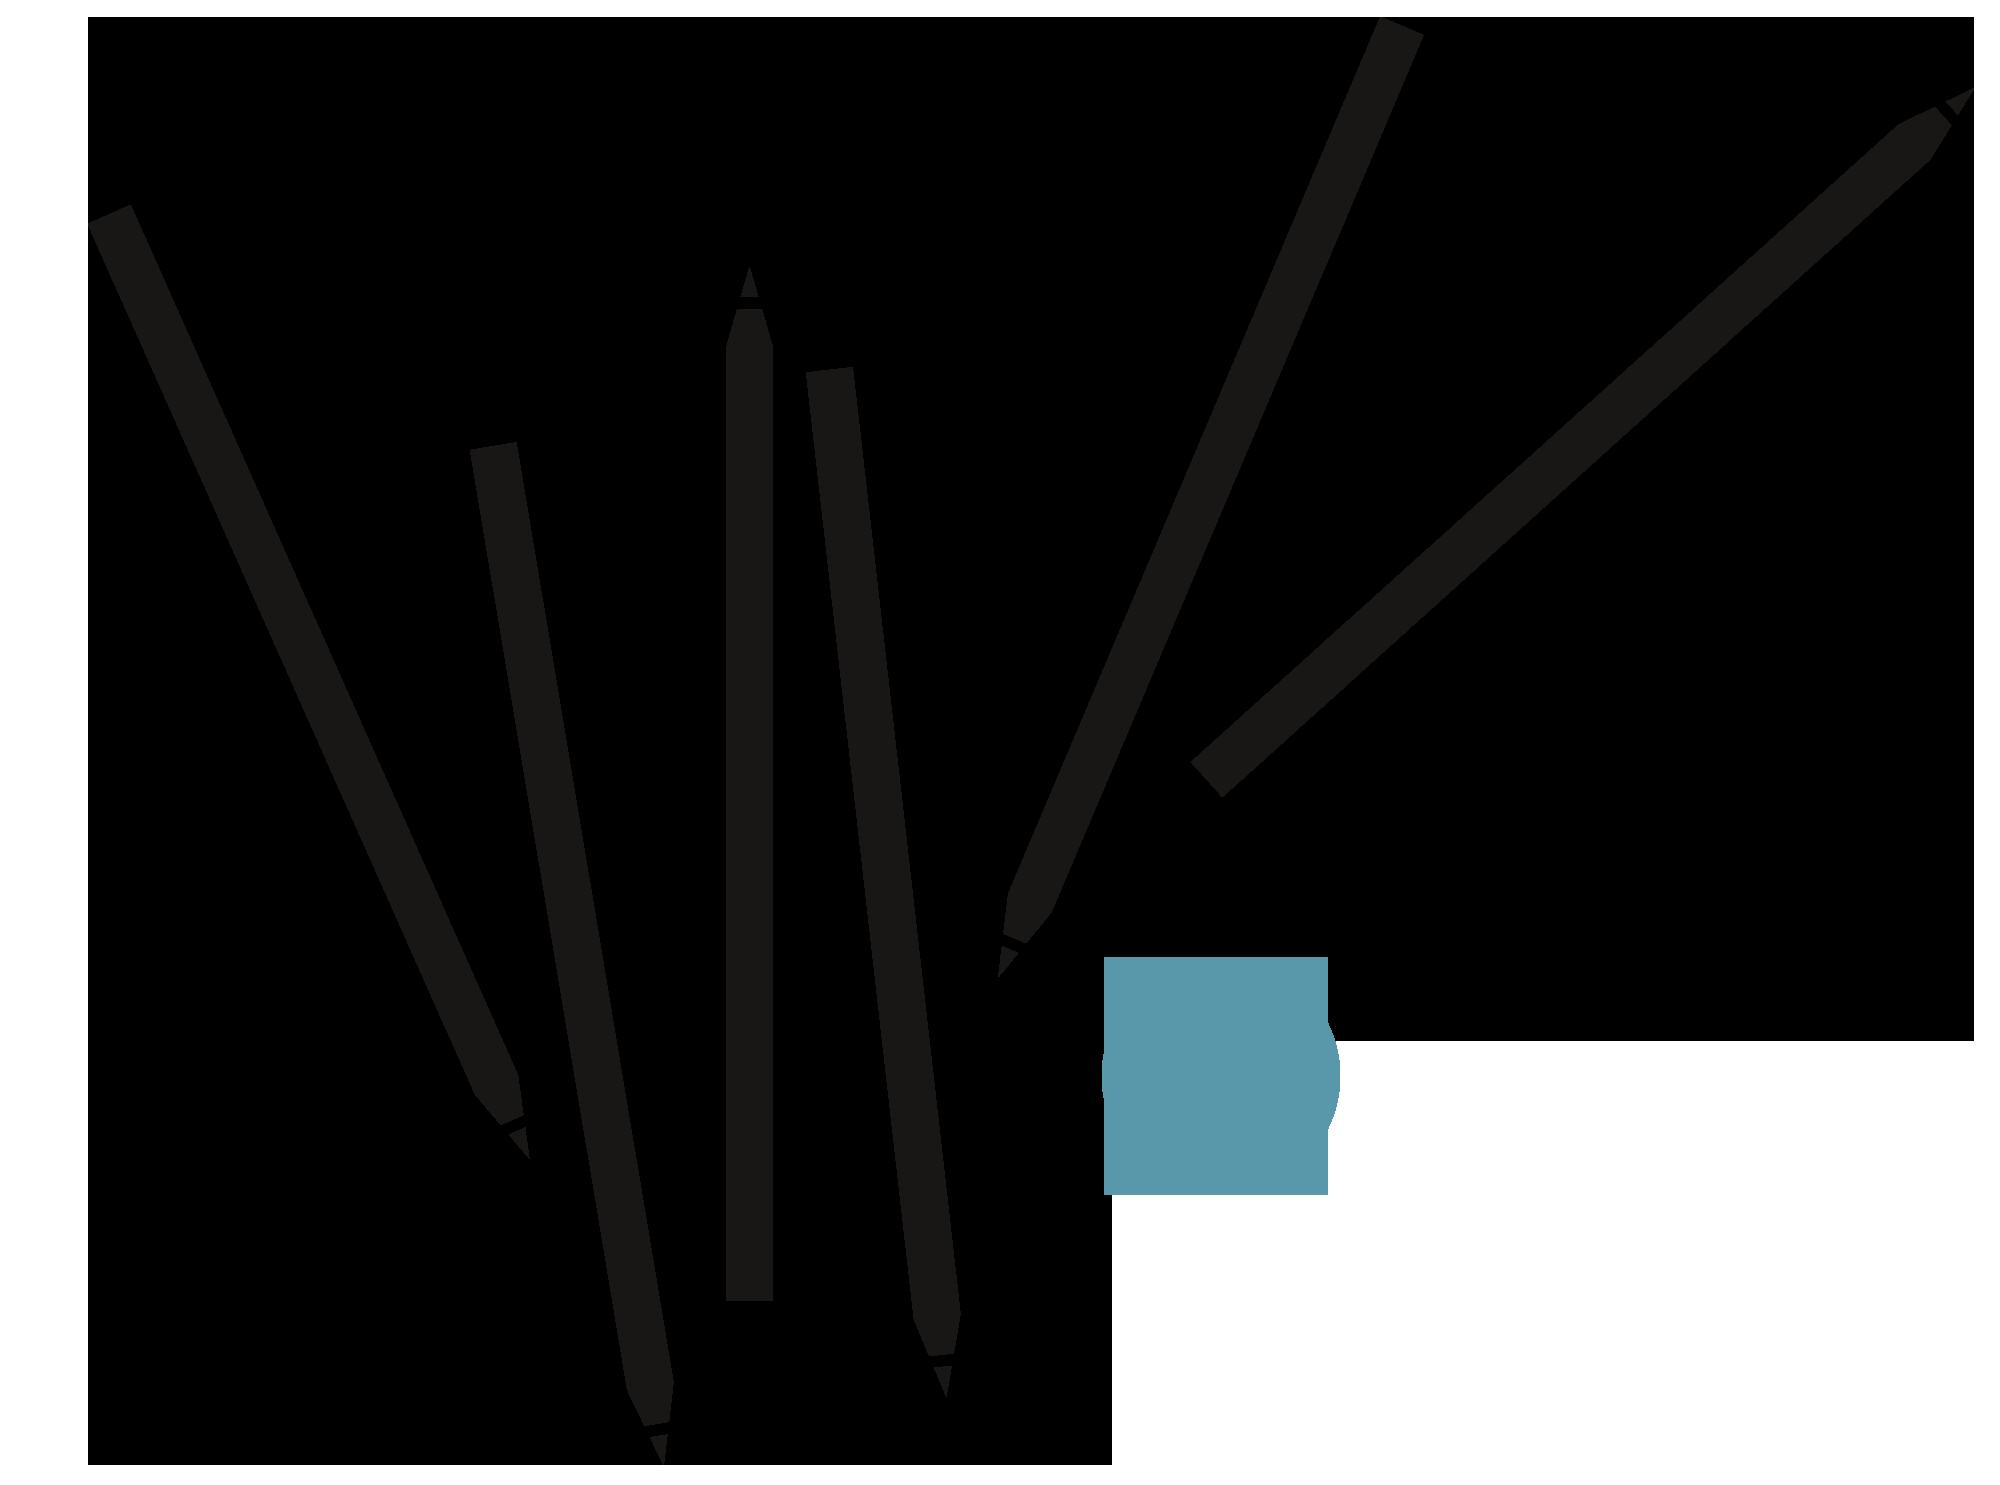 pencils-newsletter-Buero-Ink-Grafikdesign-Hamburg